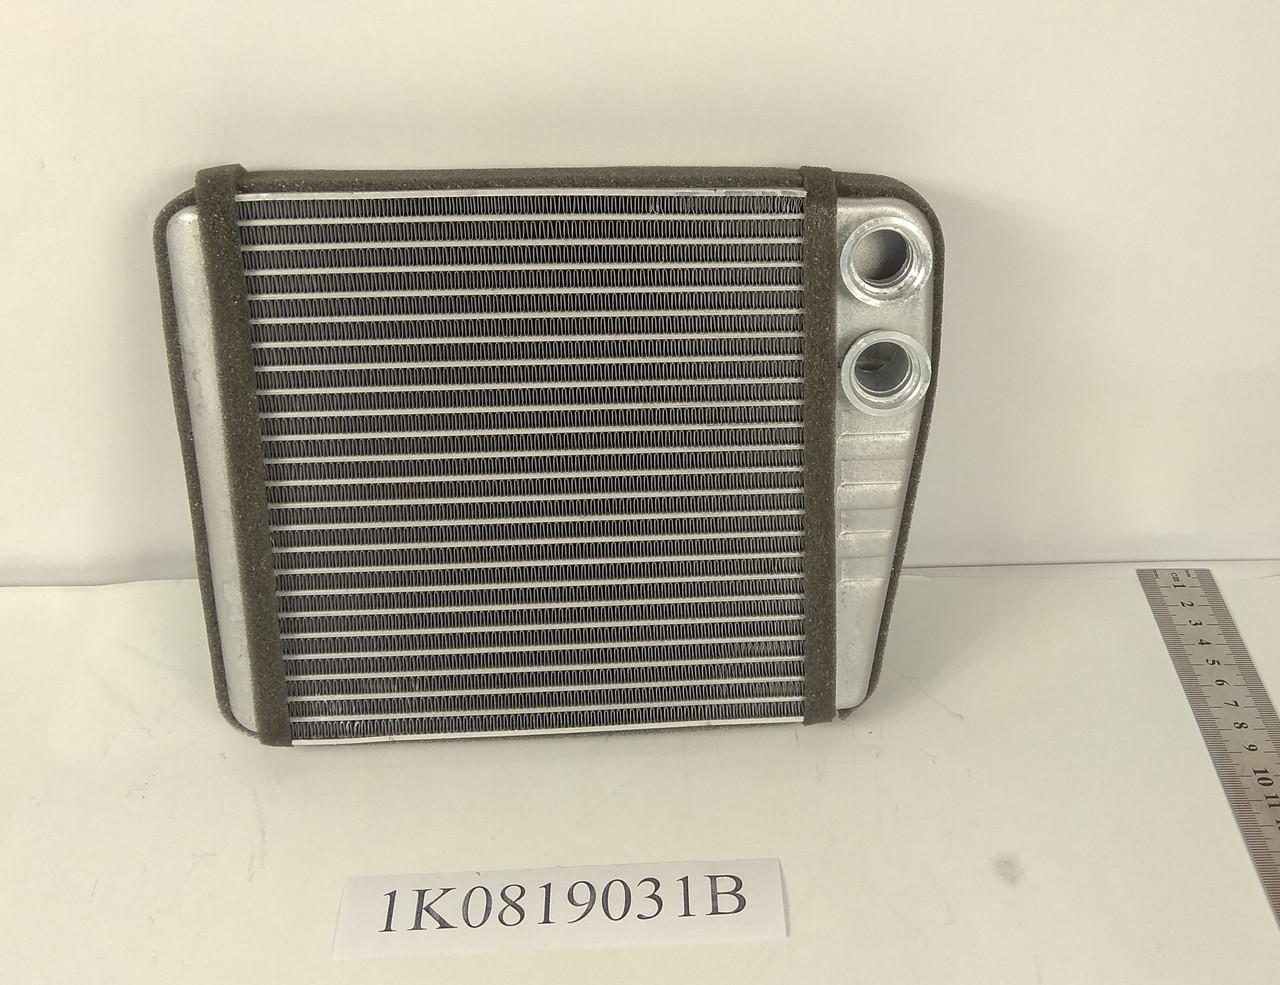 Радиатор печки Volkswagen Passat B6 2005-2010 (180*187мм по сотах) KEMP